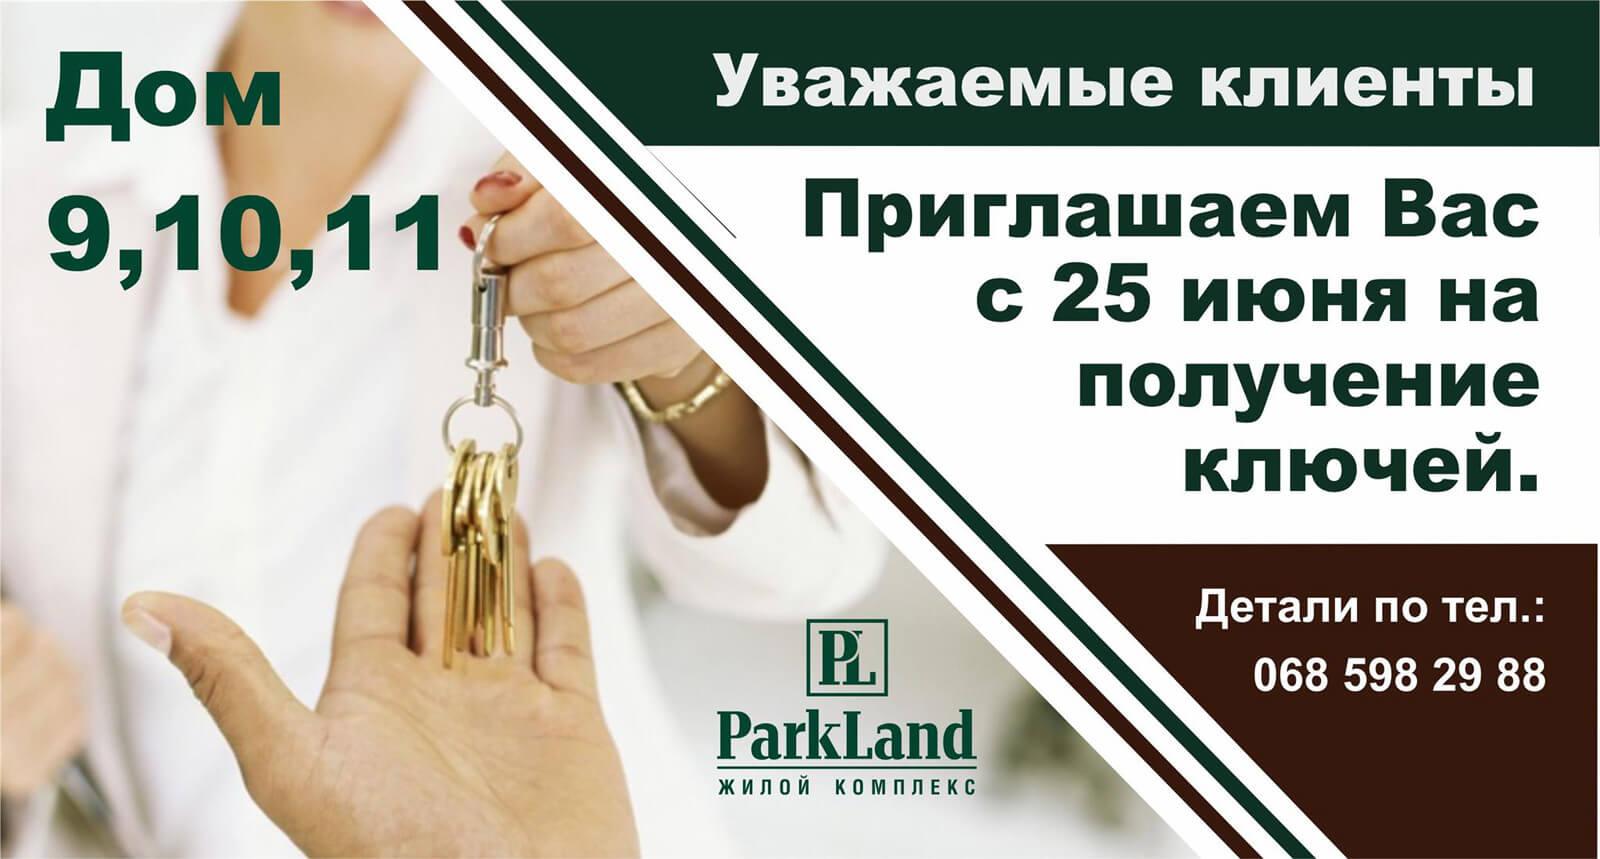 news-220618-ru-25-1